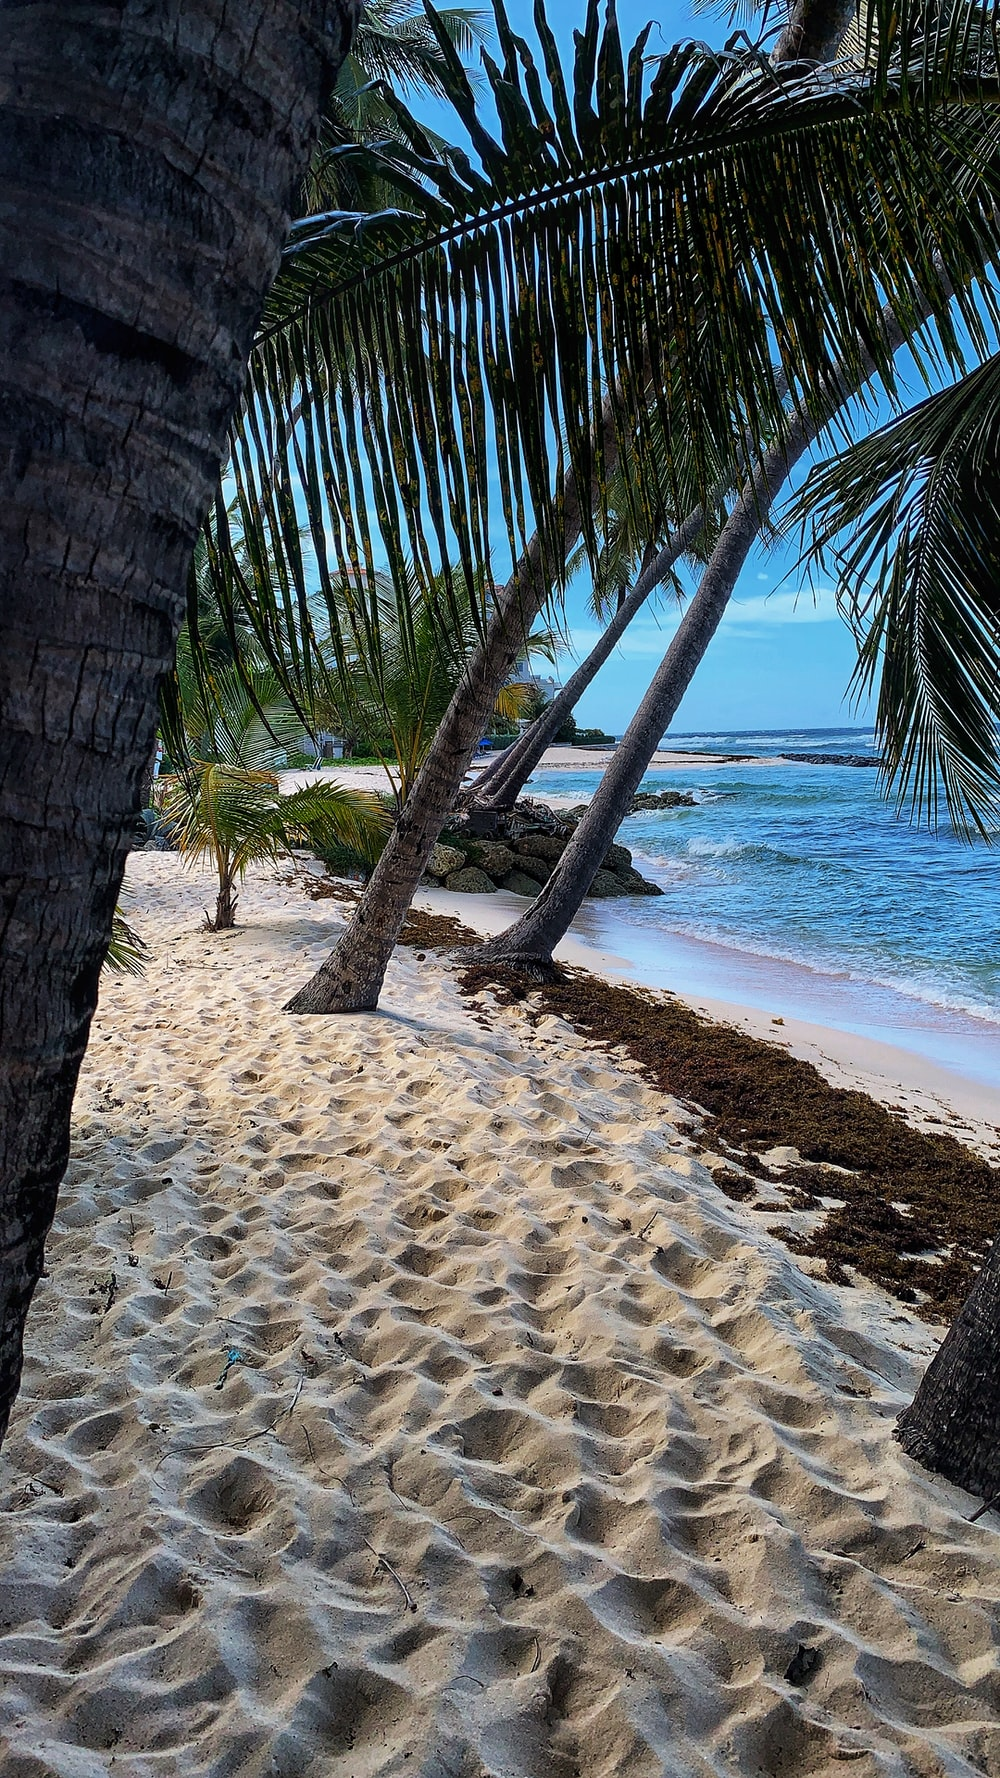 palm trees in beach